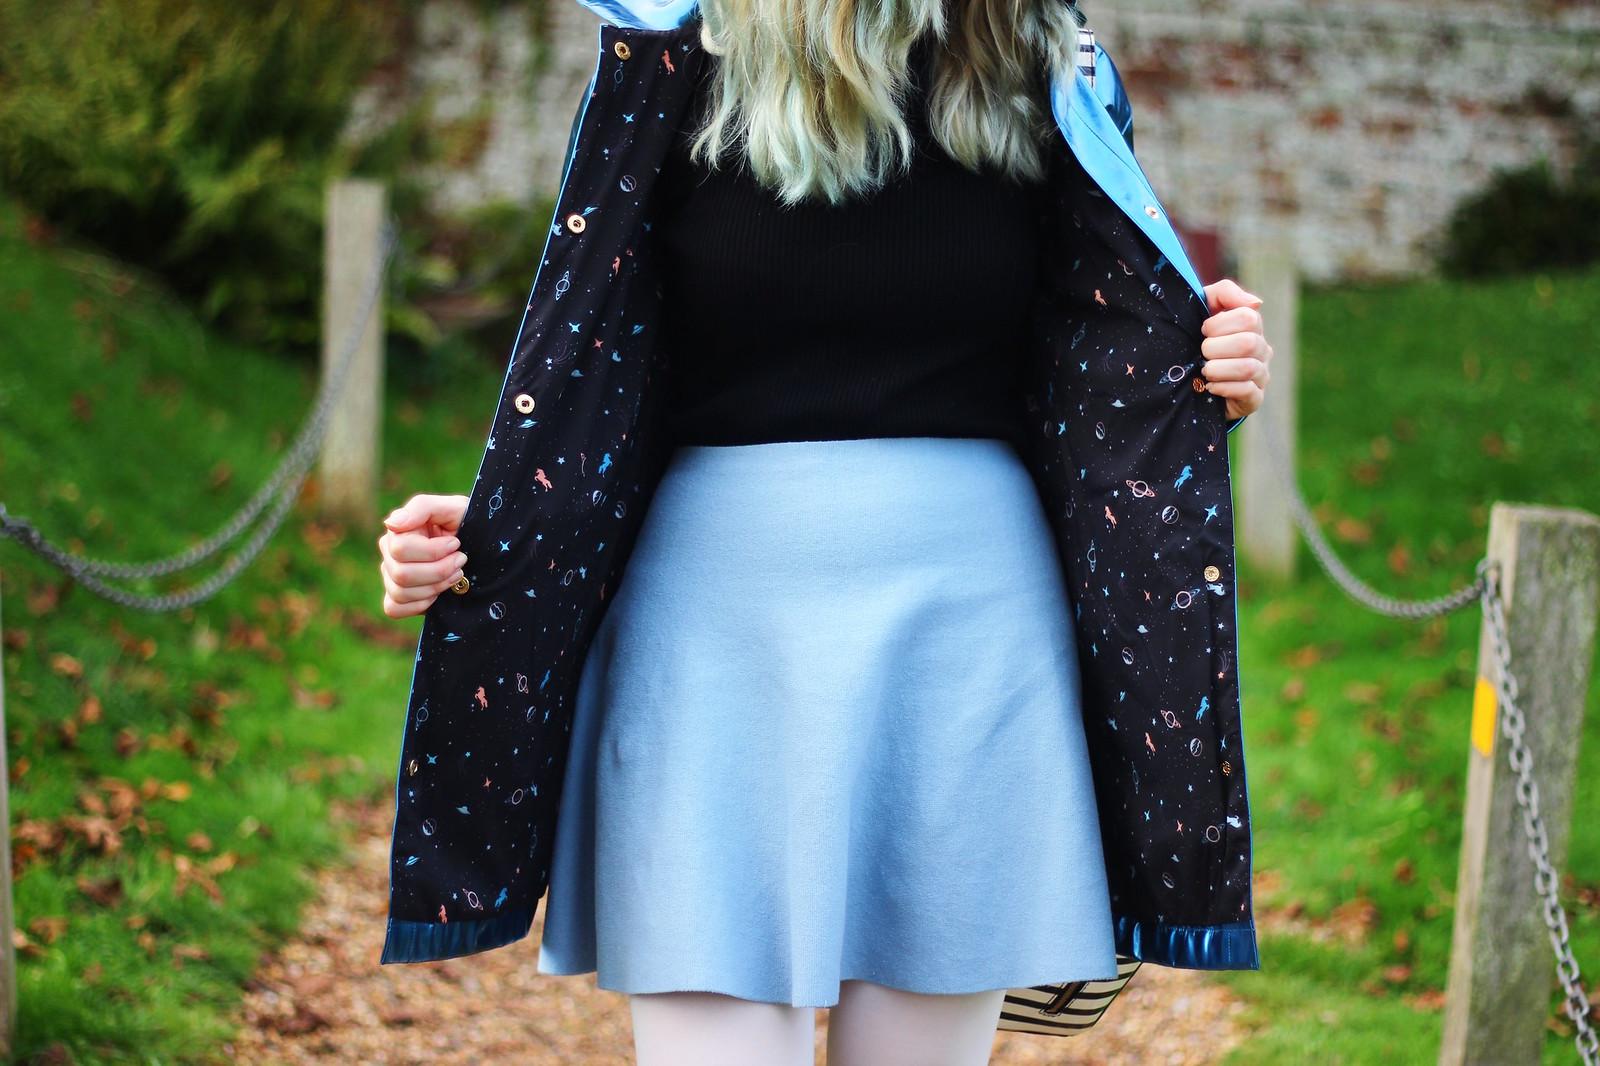 6_yumi_space_mac, space_grunge, style, pastel_hair, blogger